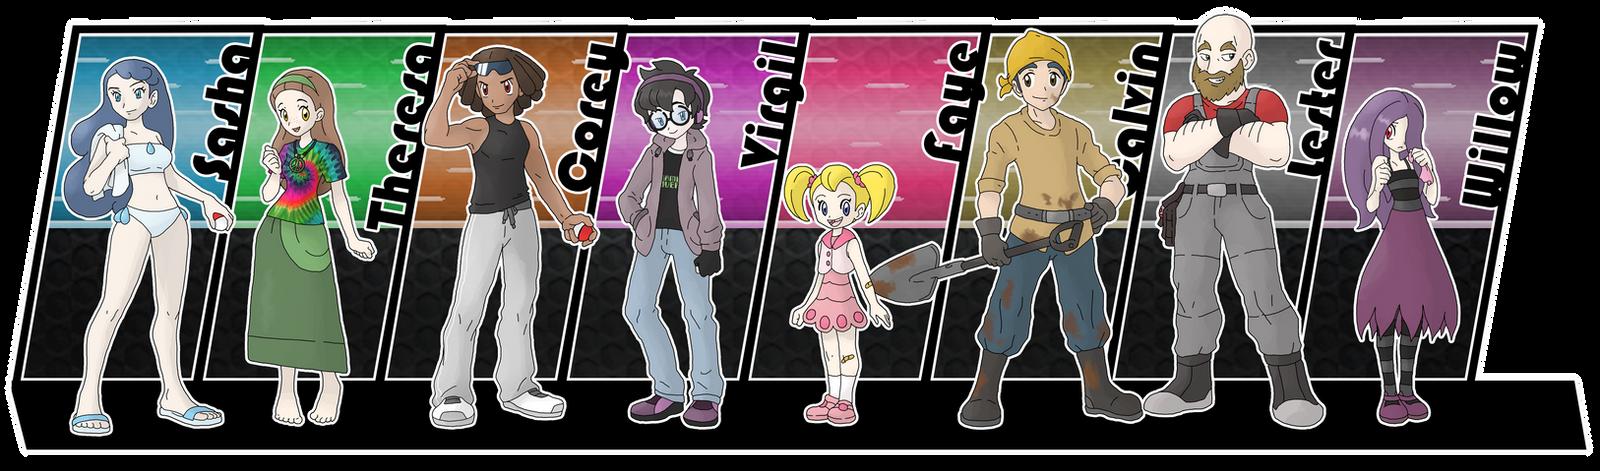 Commission - Yondaime22 Gymleaders by Cid-Fox